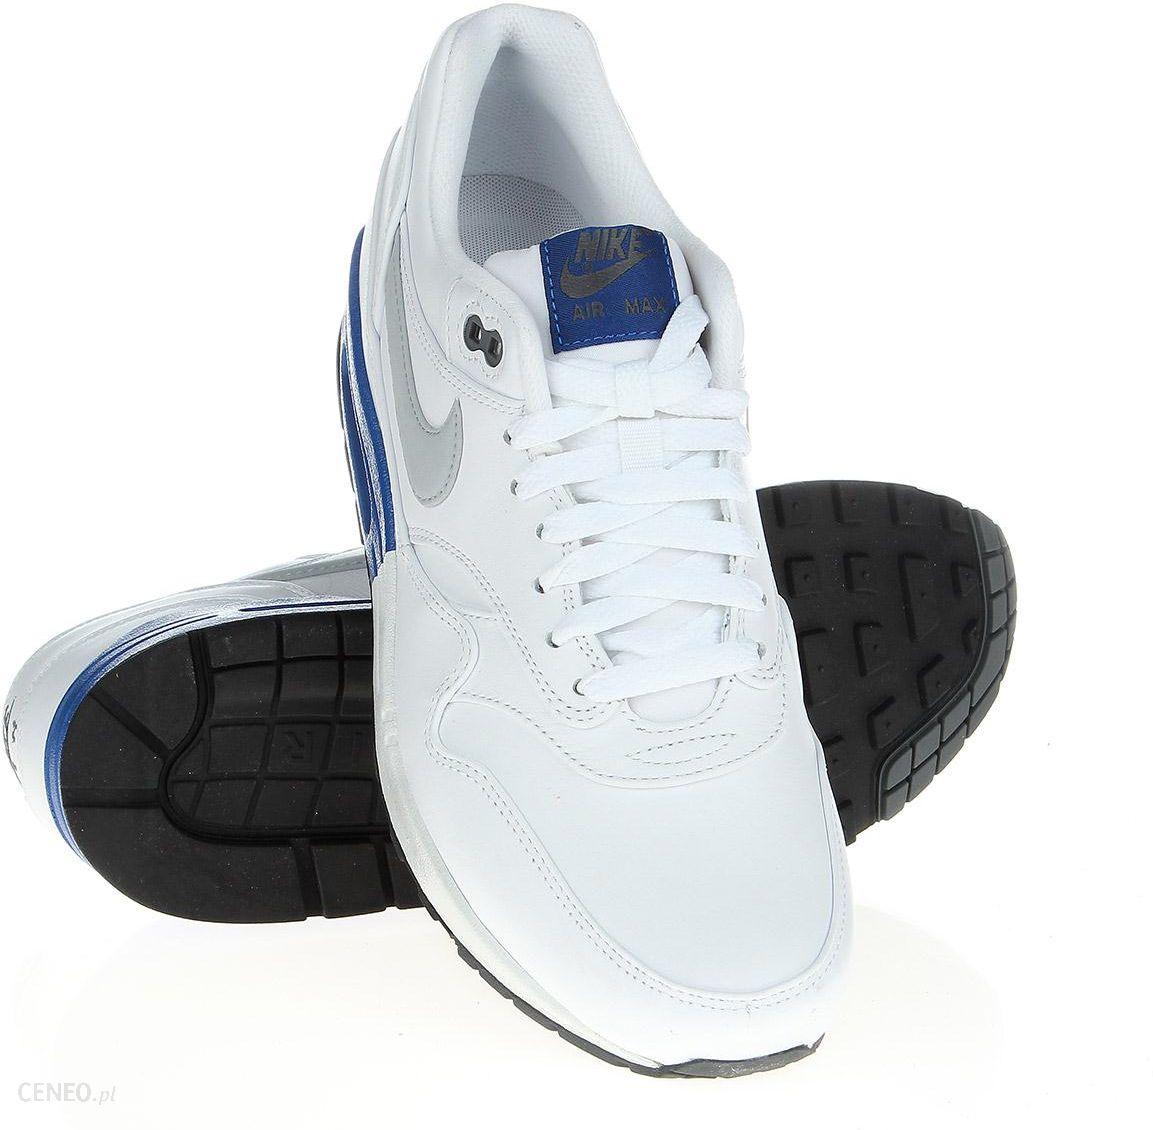 Buty Nike Air Max 1 PRM 512033 102